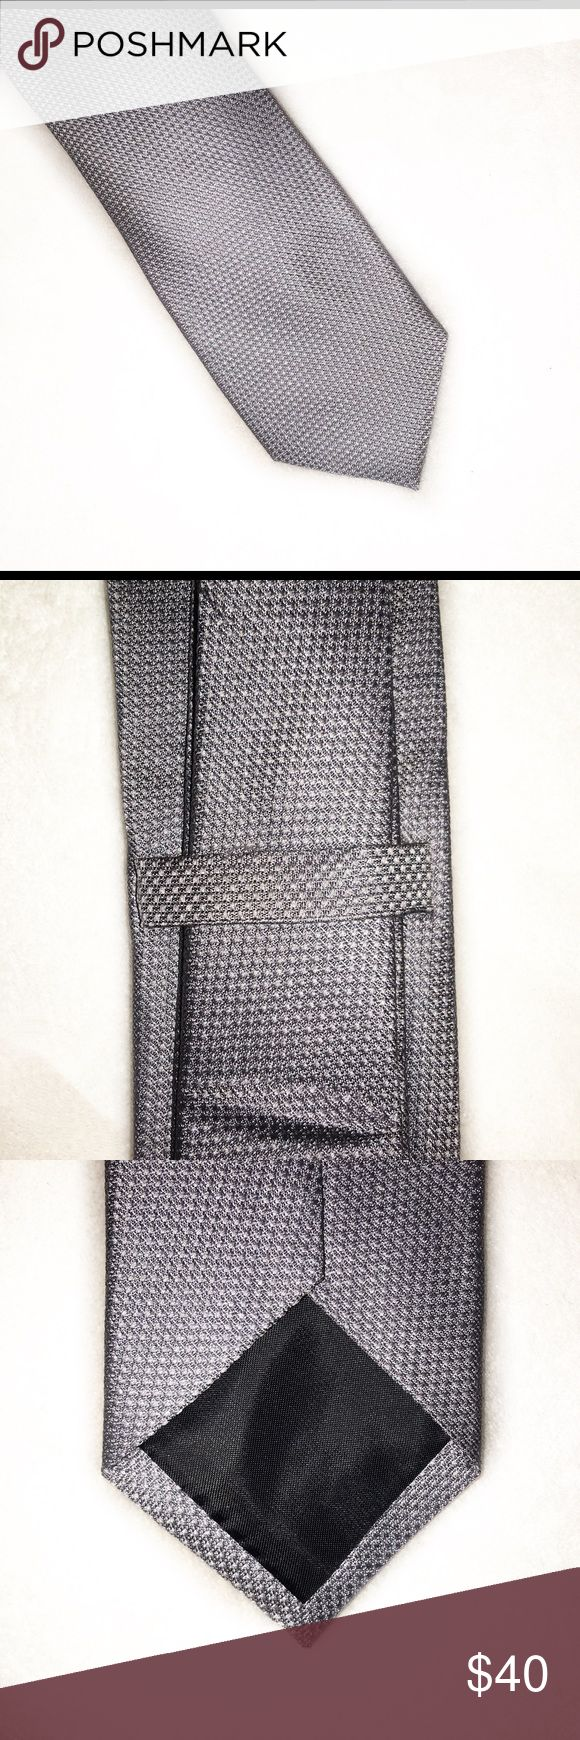 "Saks Fifth Avenue Silk Tie • Saks Fifth Avenue • 100% Silk • Slim Tie • Length - 60"" • Bottom Width - 2.5"" Saks Fifth Avenue Accessories Ties"